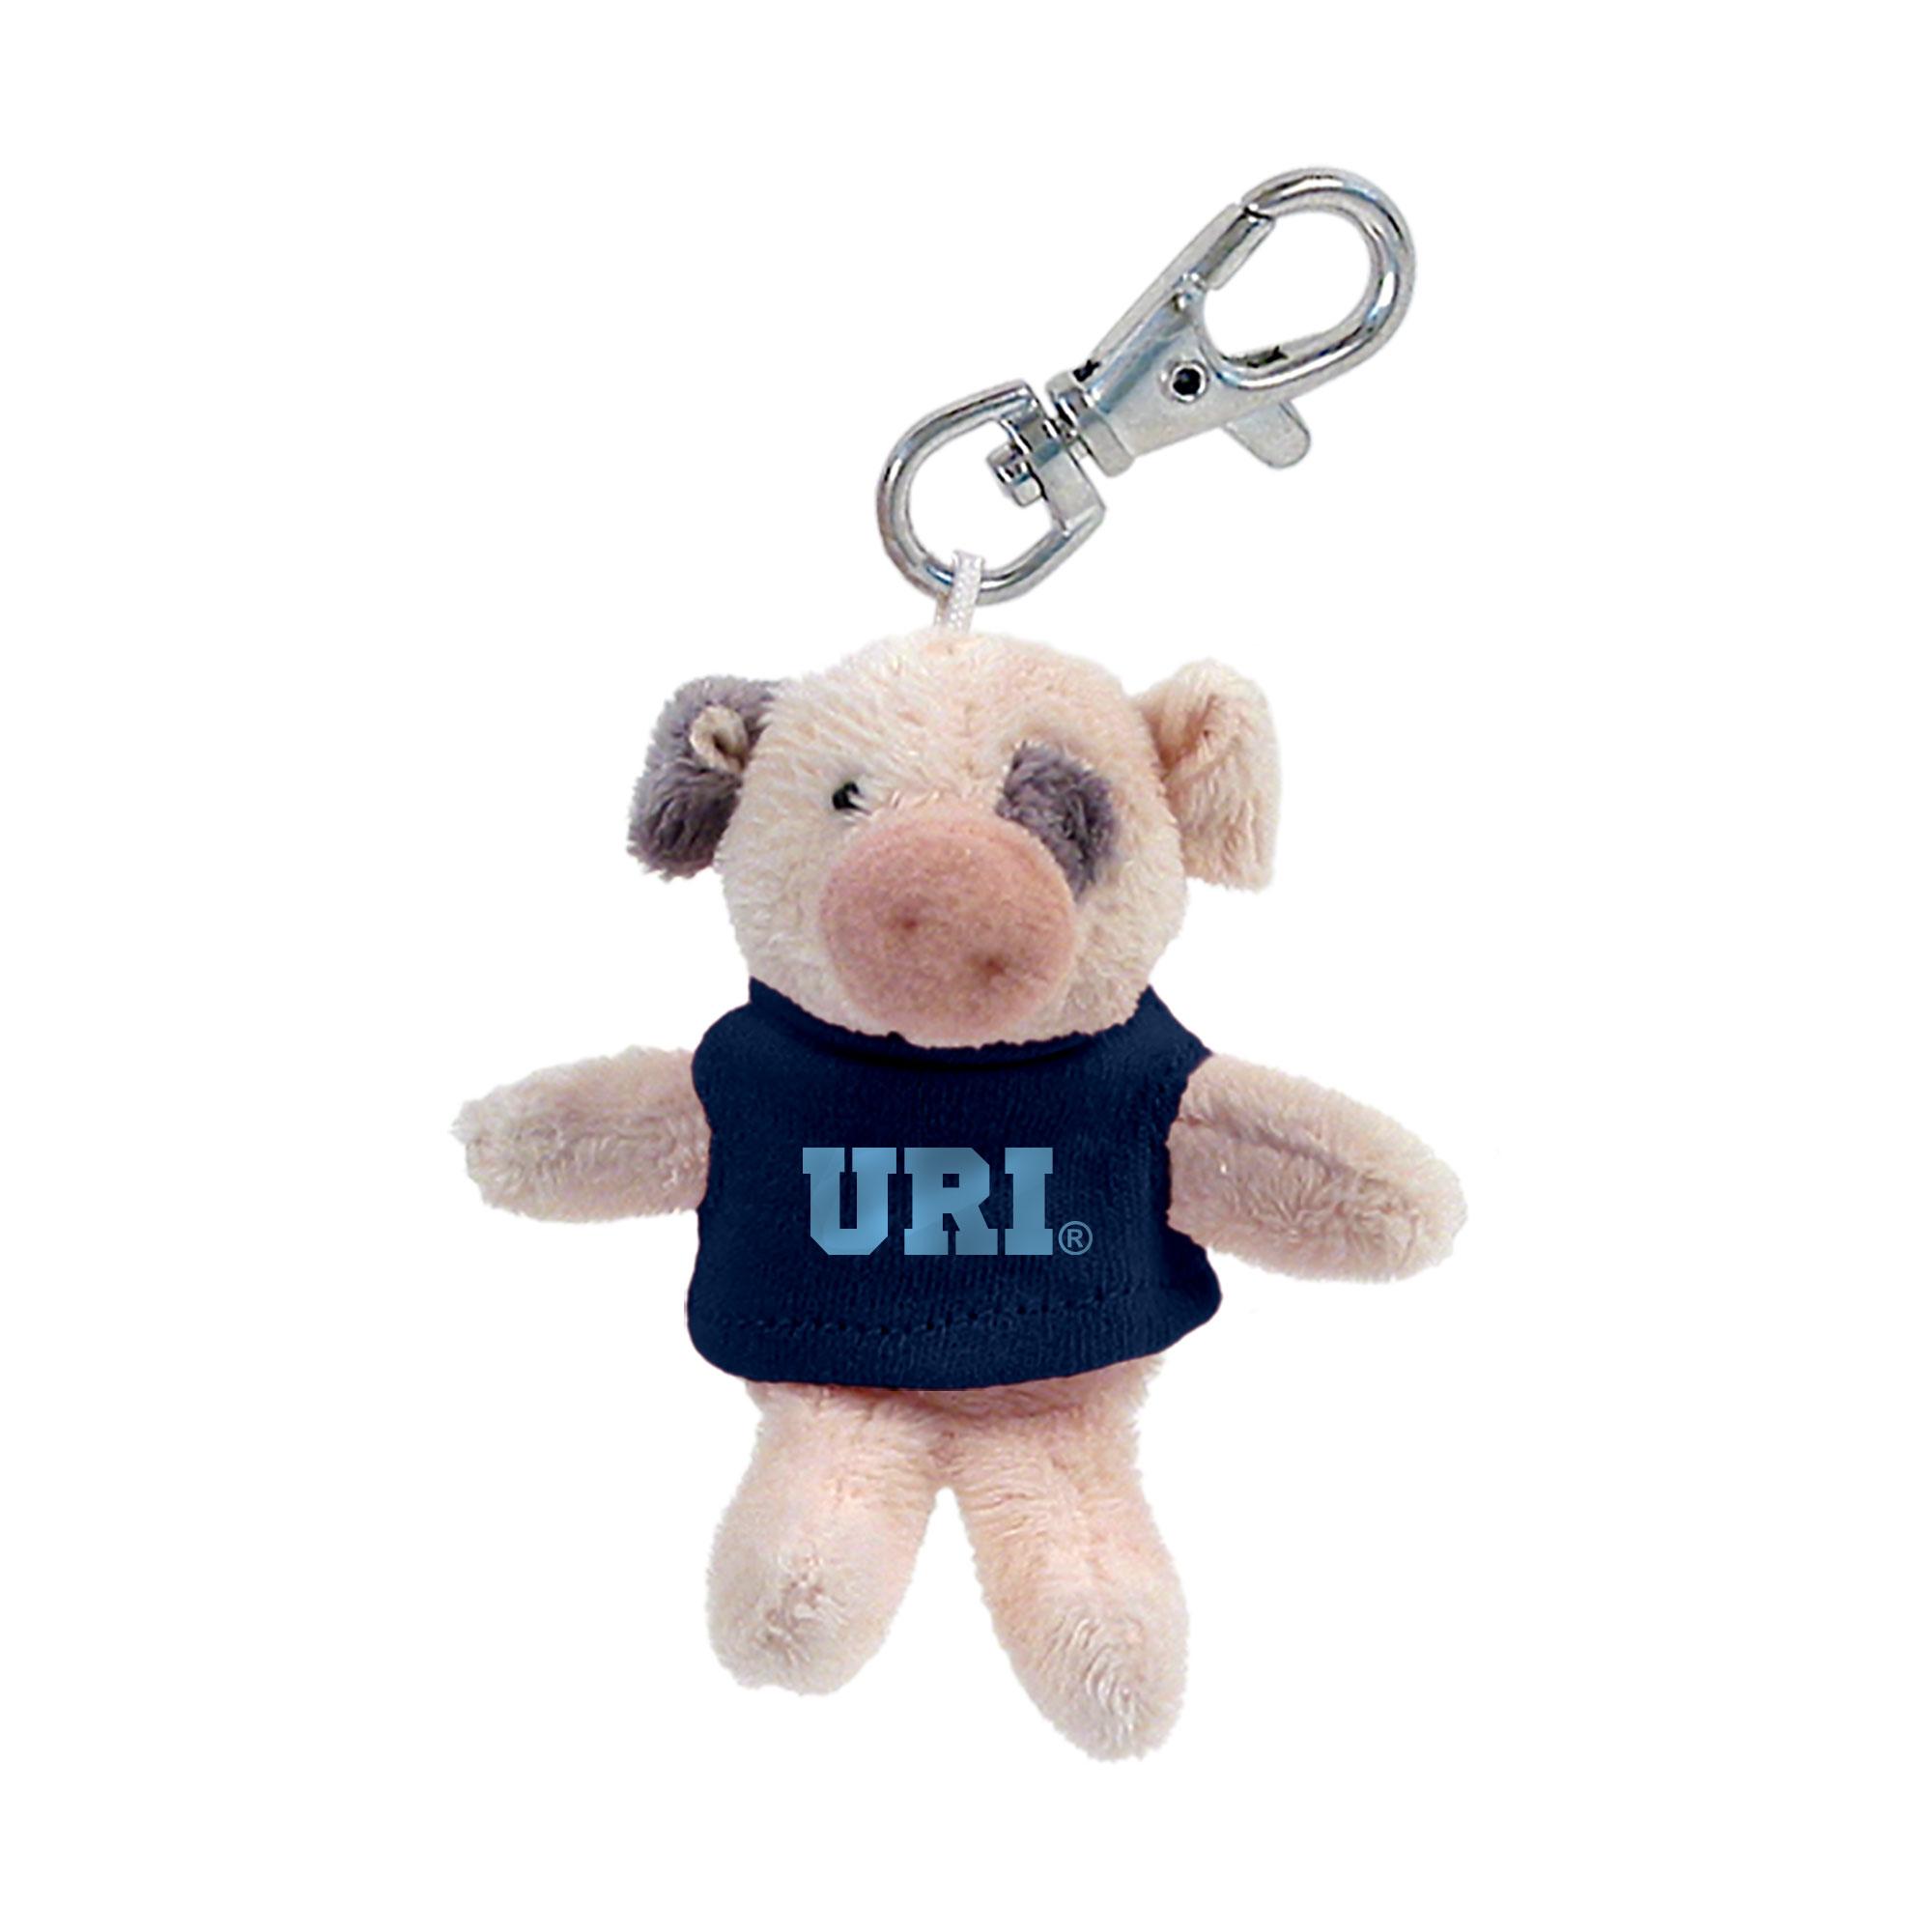 URI Pig Key Chain